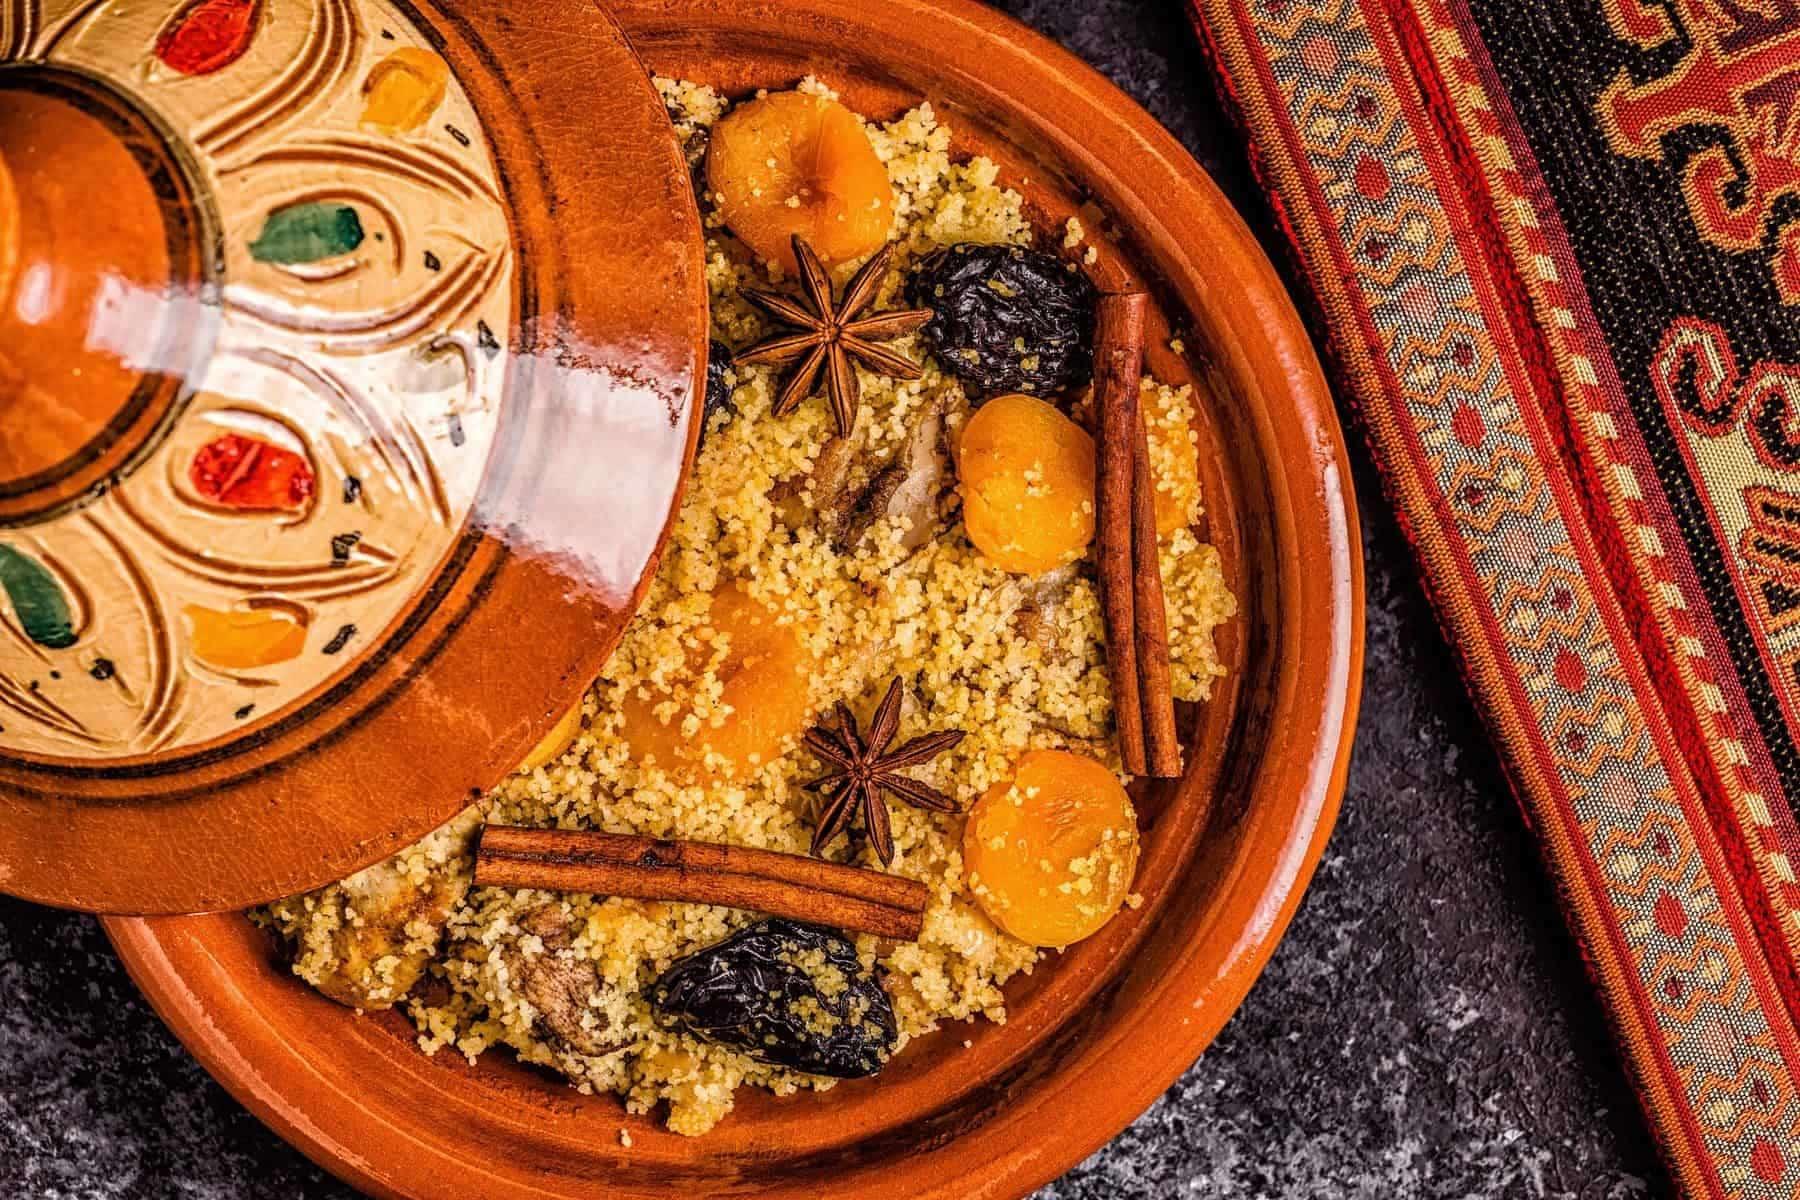 Mole-Mexicano-Poblano-mole-ingredients-mexican-spicy-food-traditional-in-Mexico.